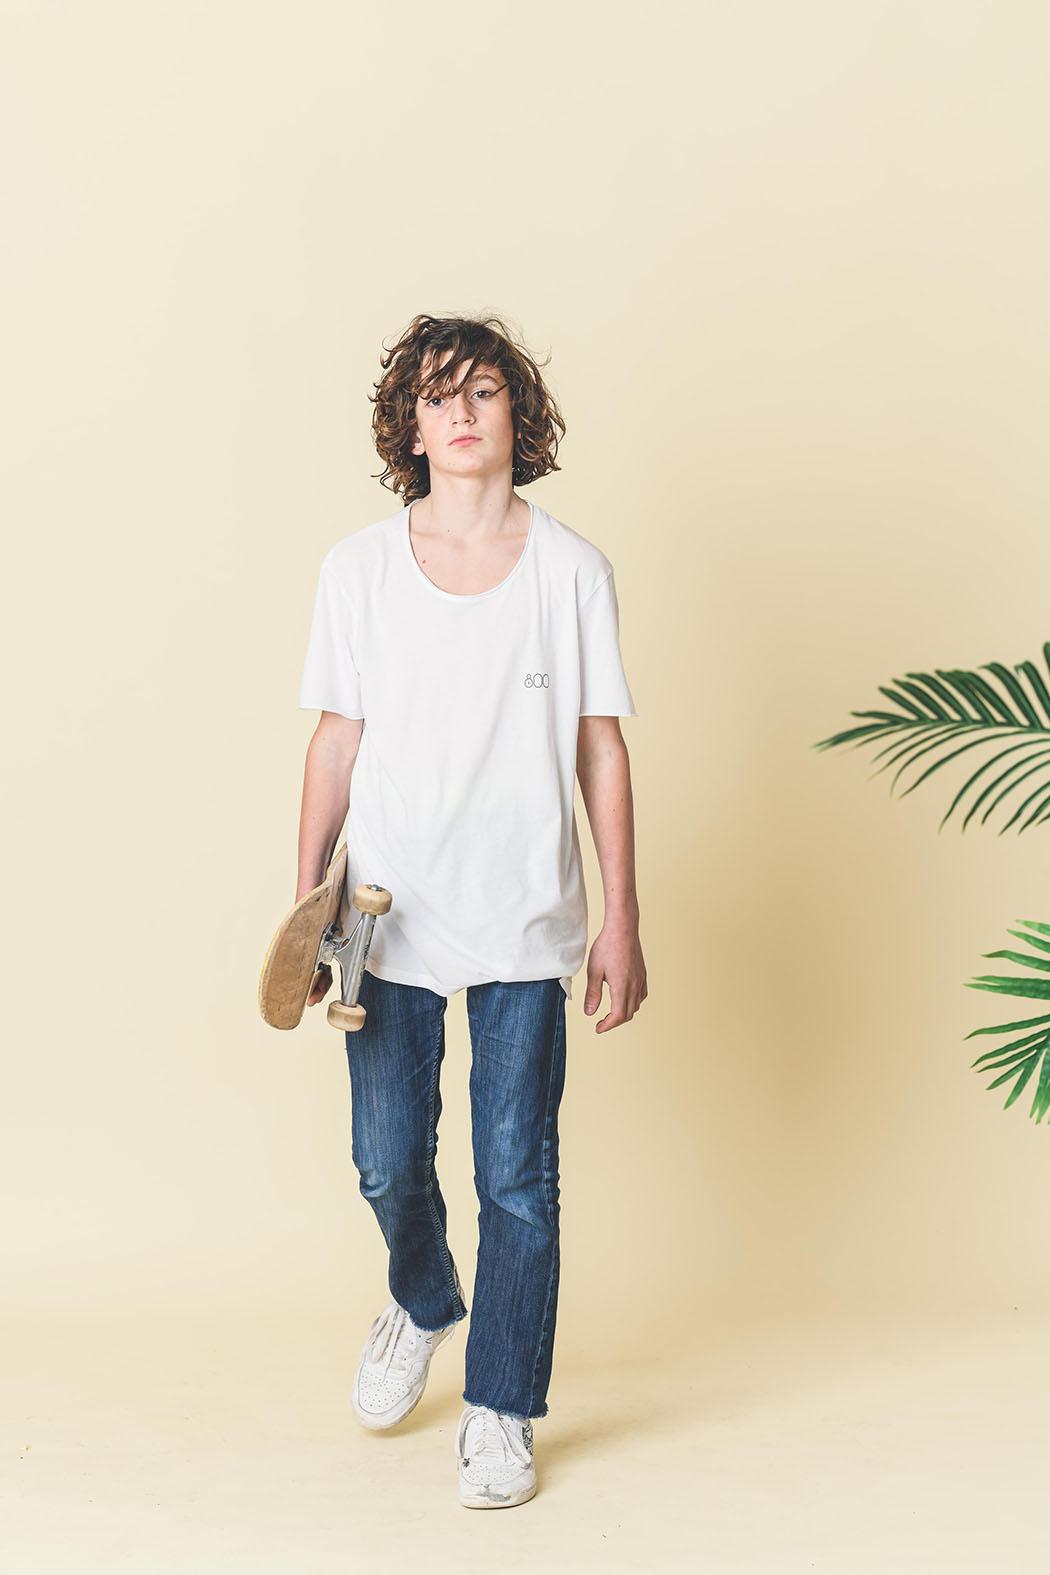 Laurent-scavone-photographe-mode-studio-lille-16